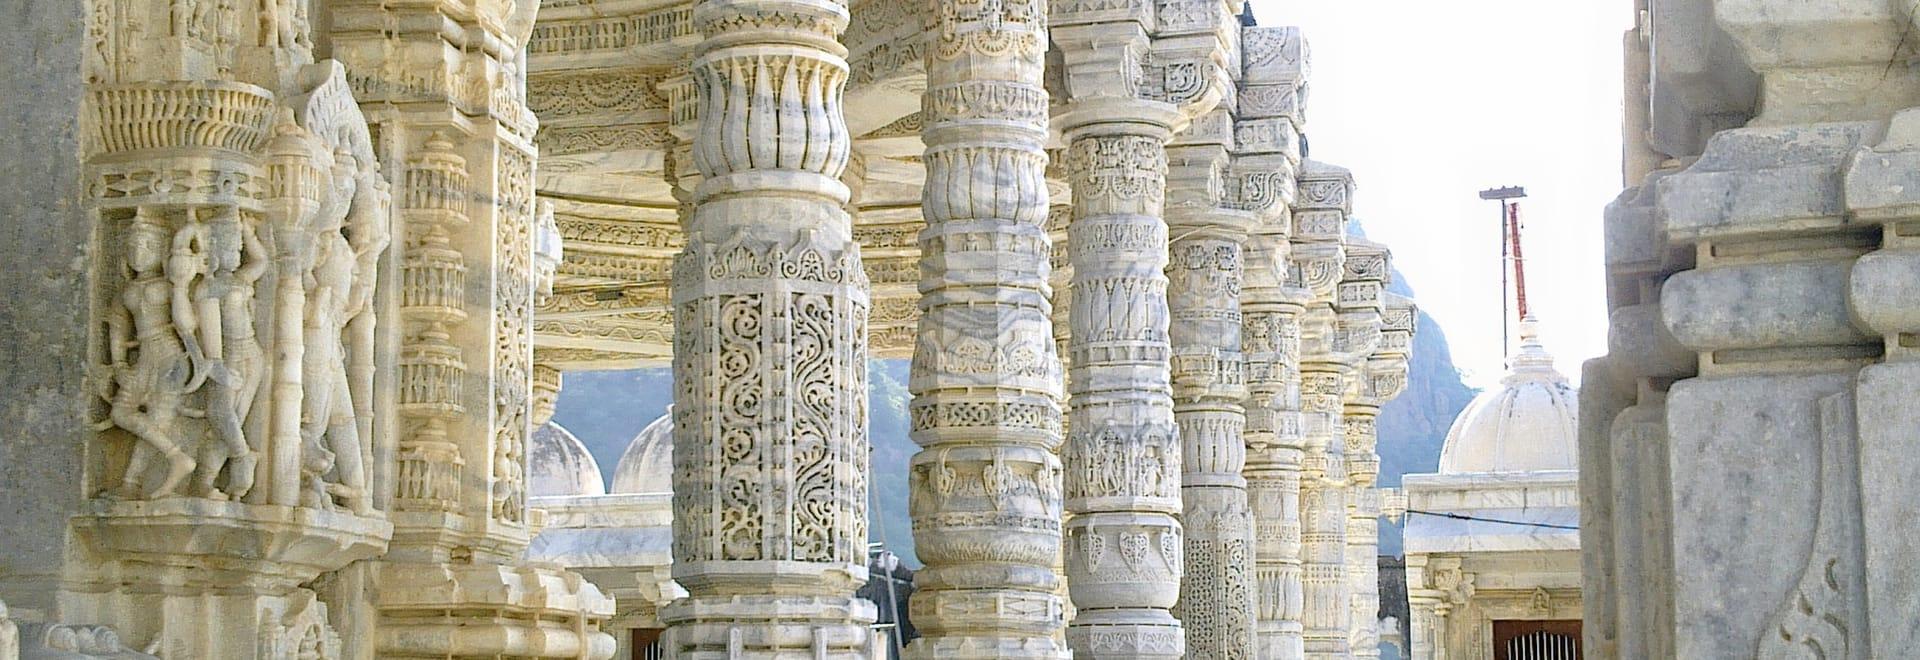 1492501545_pillars_at_the_mirpur_jain_temple.jpg